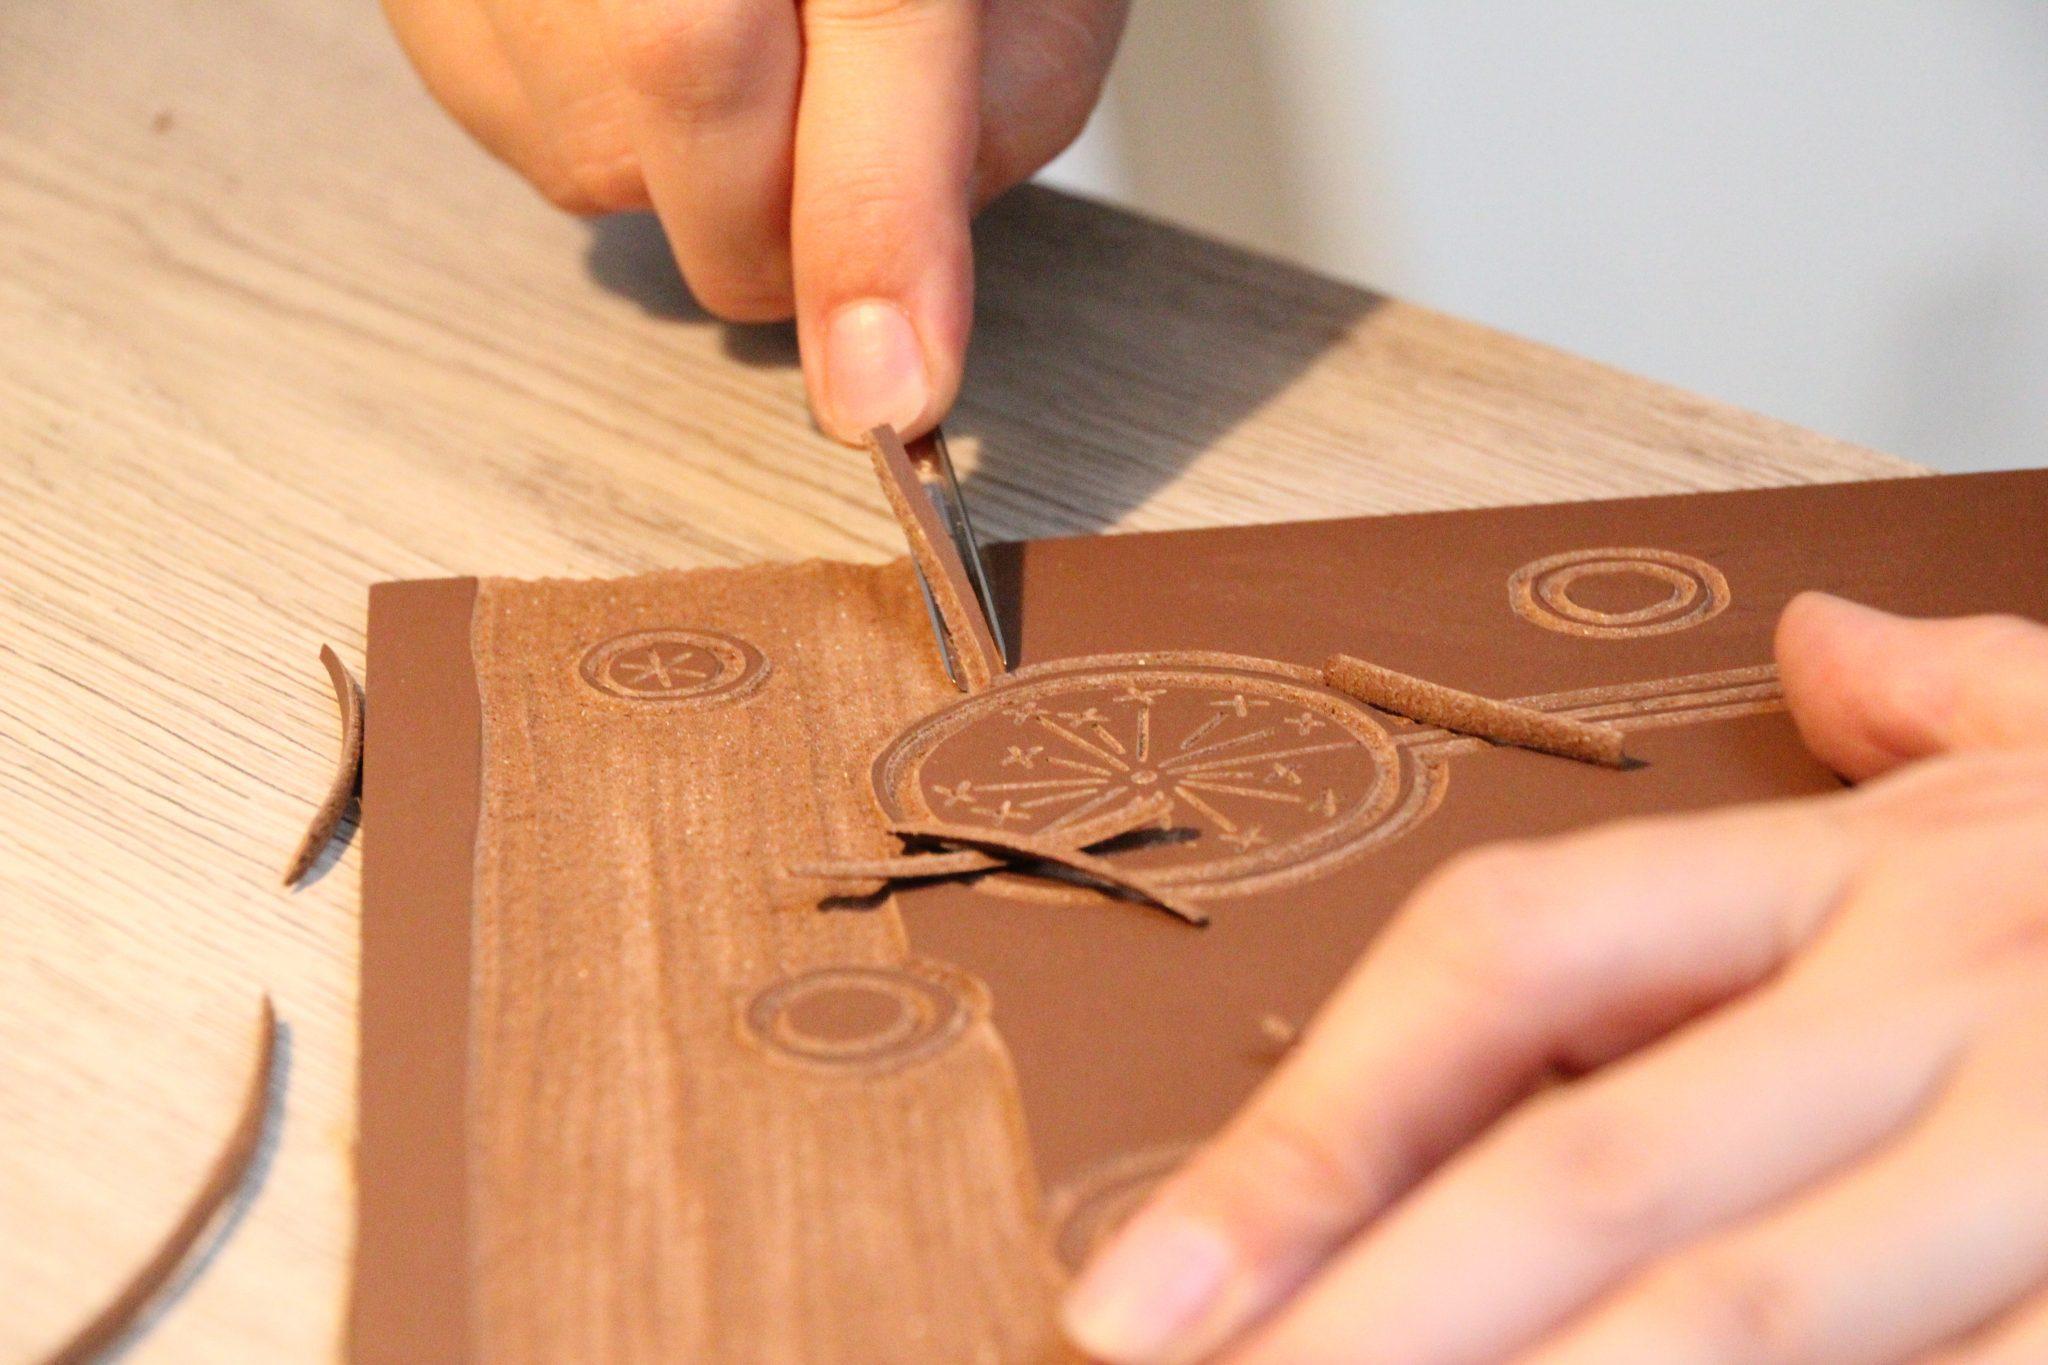 Azilise de LinoLino au travail (gravure) | LinoLino | Linogravure | Créations artisanales